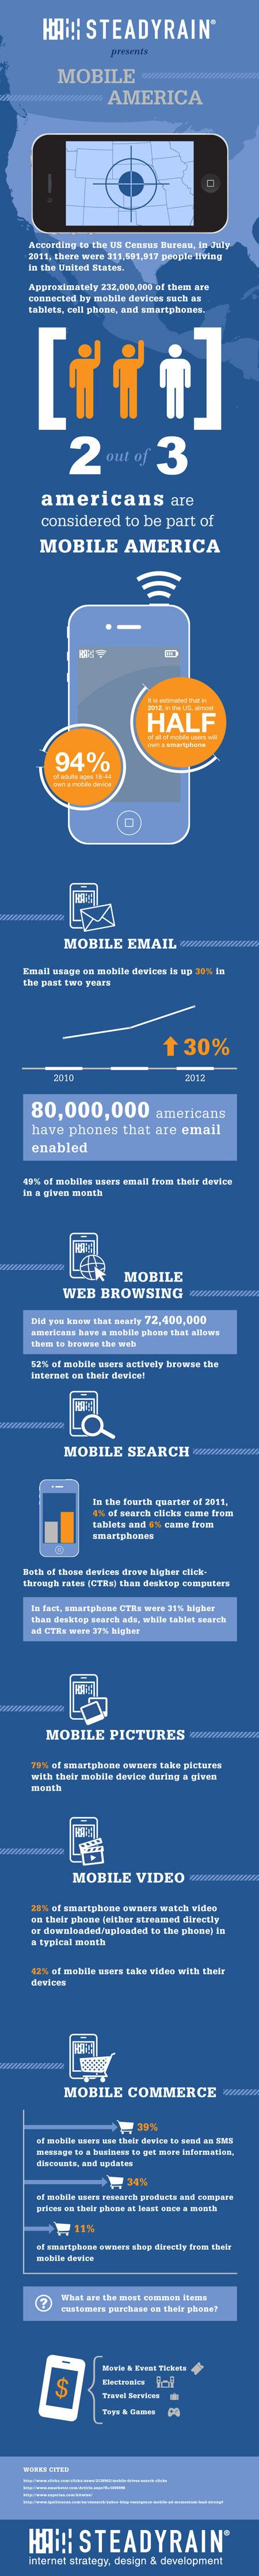 U.S. Mobile Phone Usage Statistics [INFOGRAPHIC]